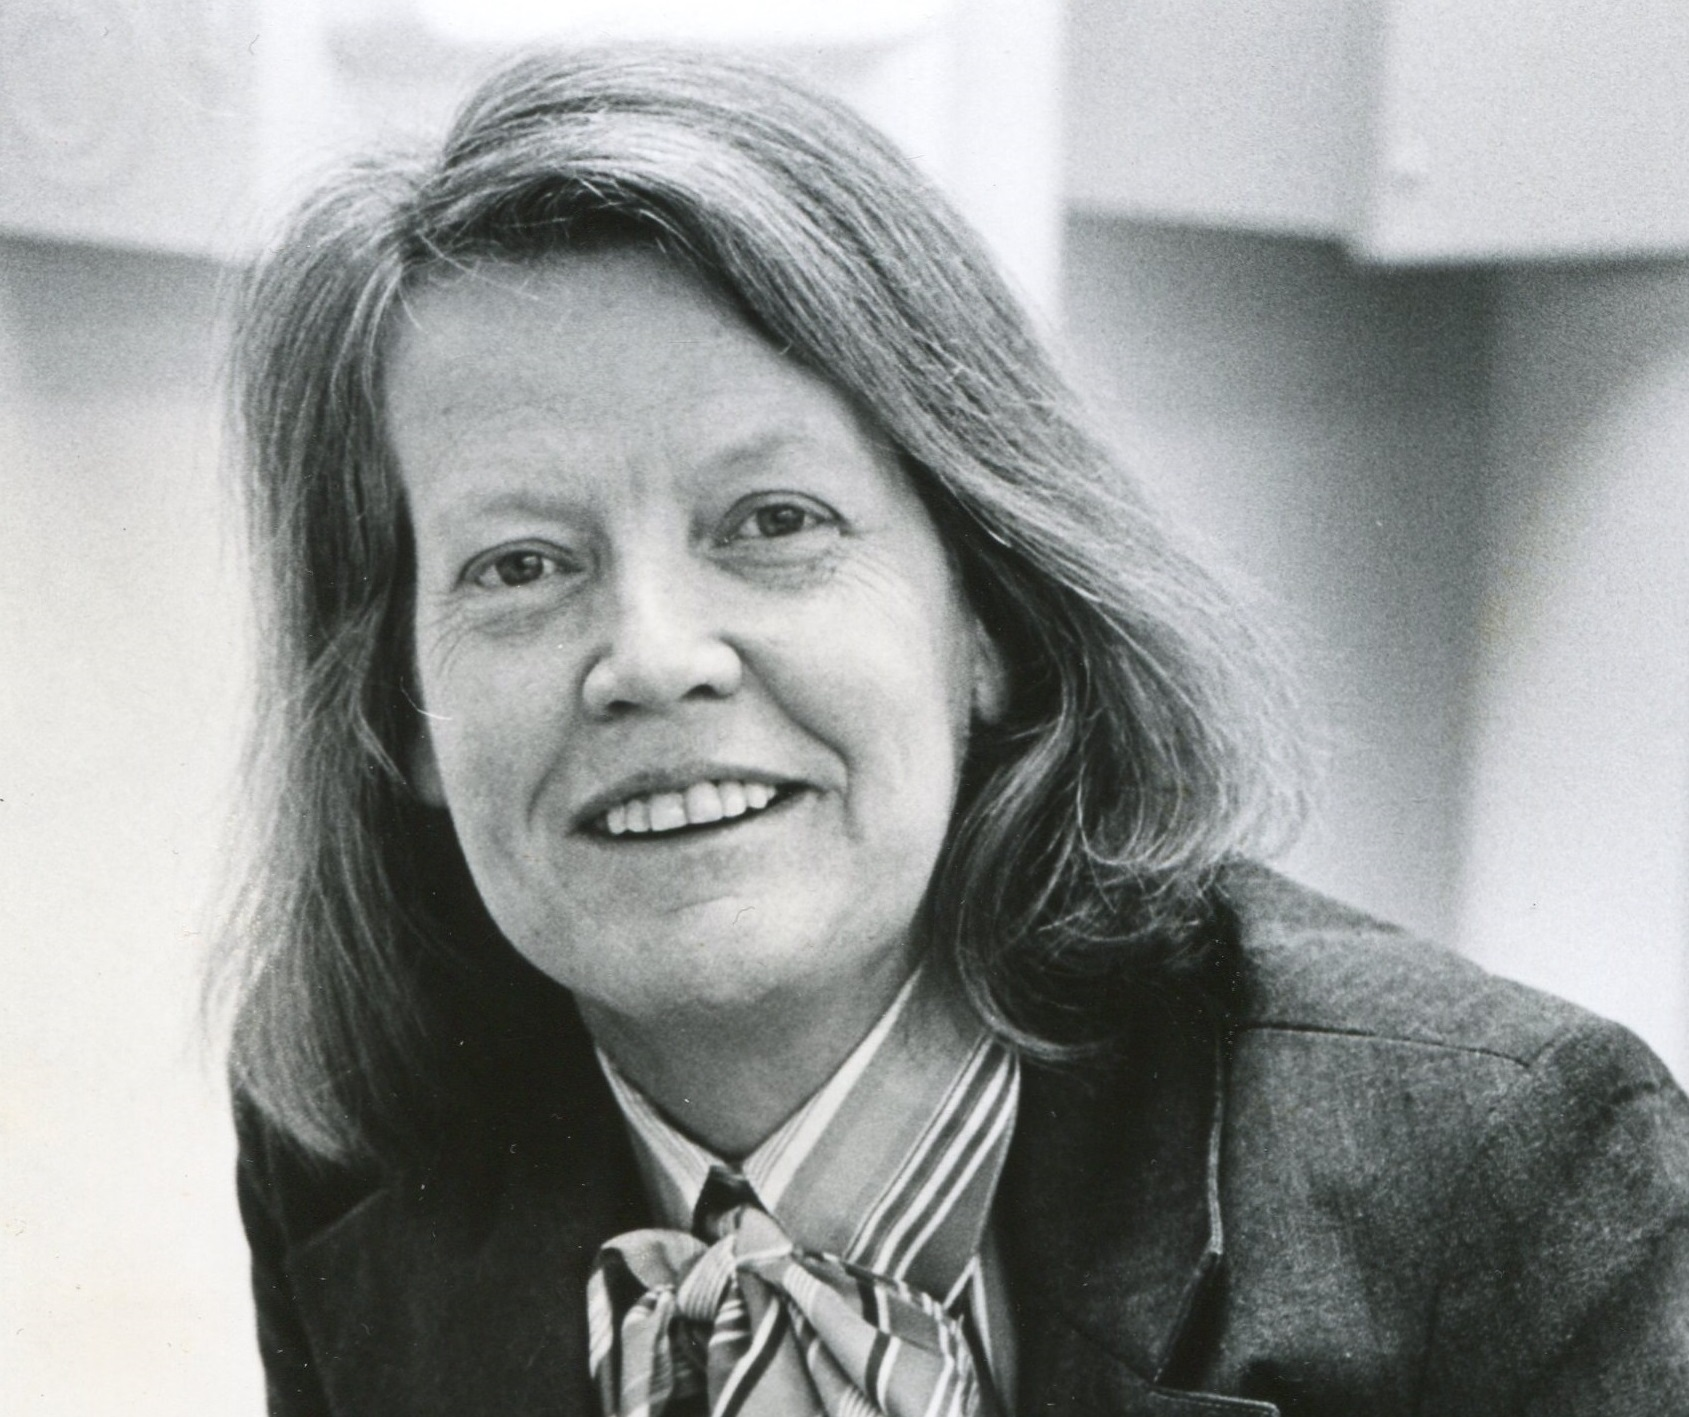 A people's mayor — remembering Barbara Ackermann